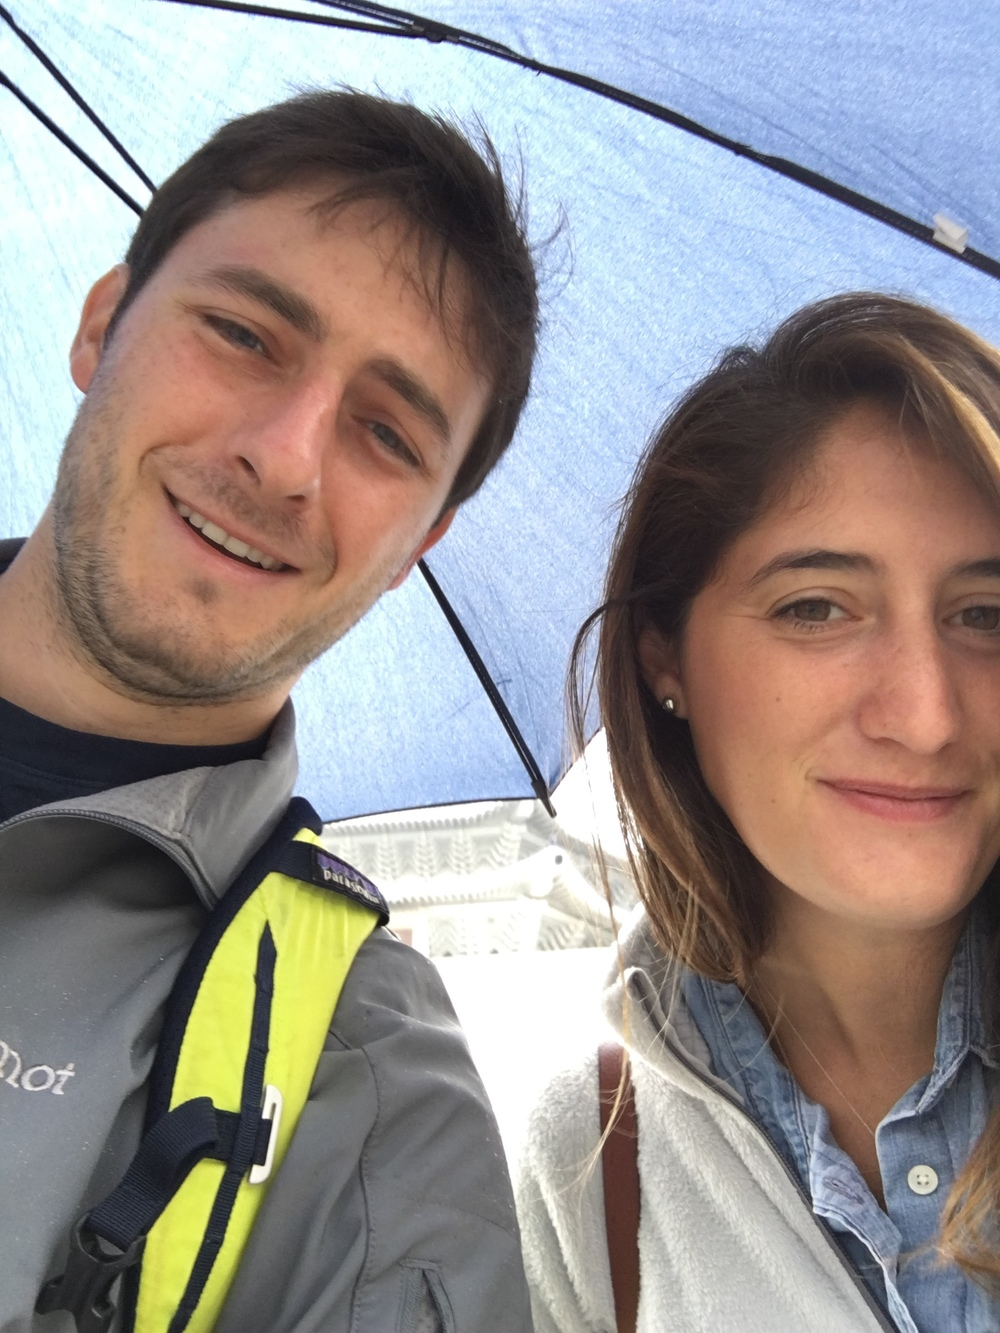 Rain selfie